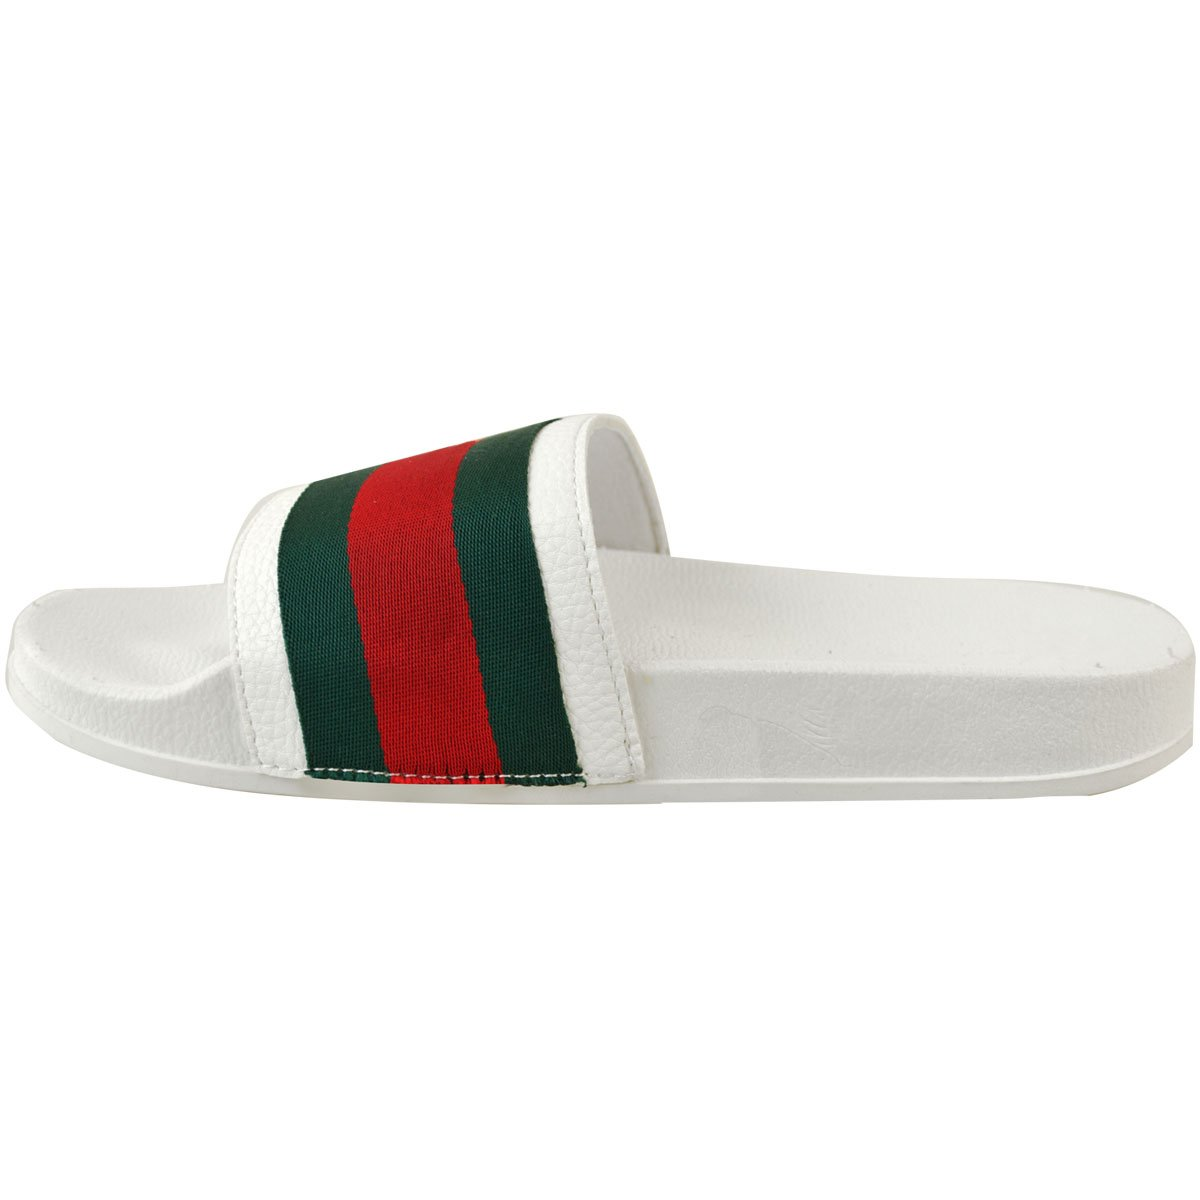 ecf75e90f Fashion Thirsty Womens Flat Striped Sliders Summer Sandals Slides Mules  Slider Slippers Size FSD75  White  8